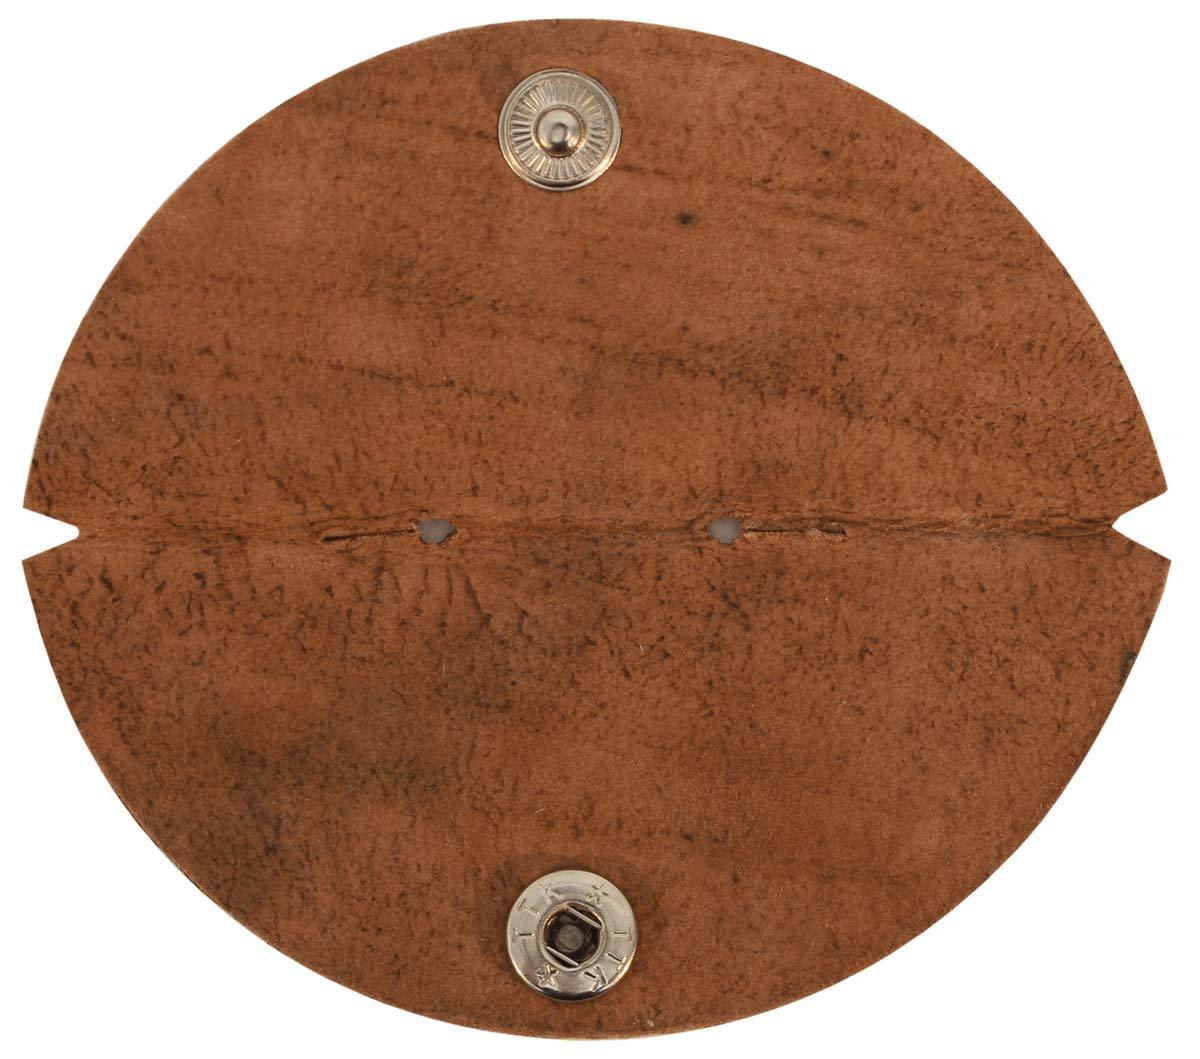 Gusti Leder nature Stuart Sujetacables de Cuero Bridas Auriculares Abrazadera Pinza Organizador A138b